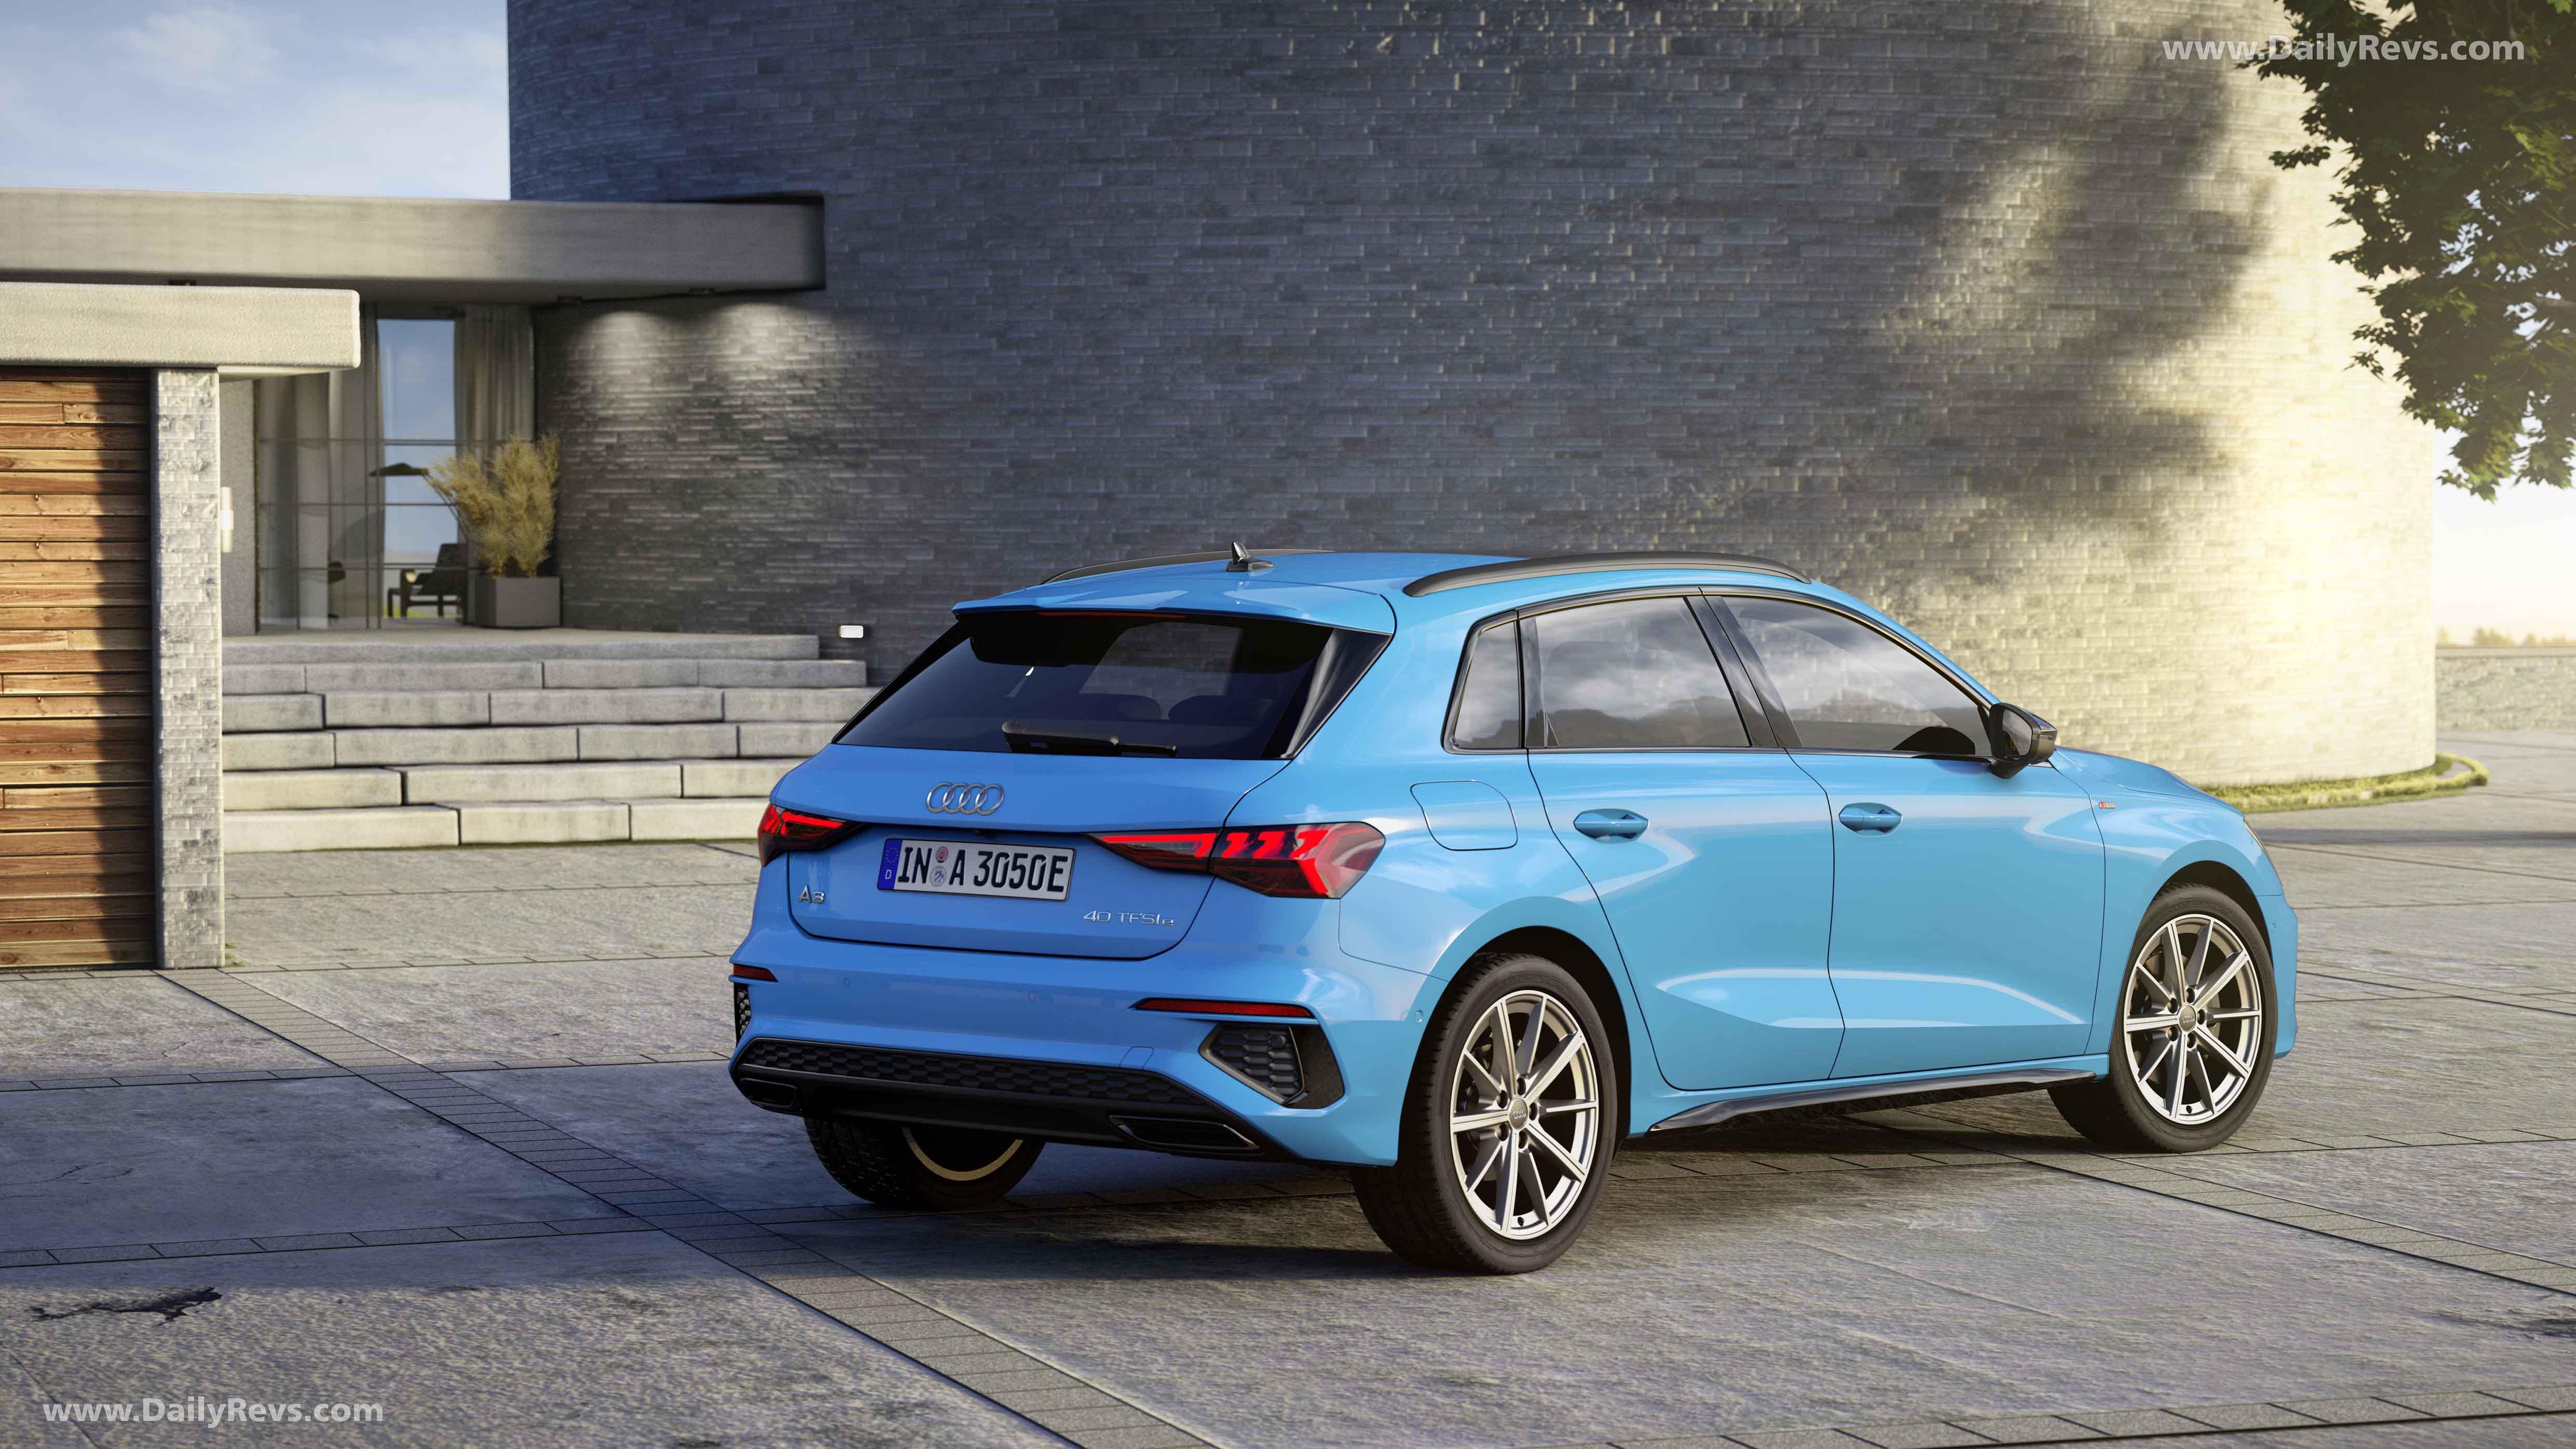 2021 Audi A3 Sportback 40 TFSI e - Dailyrevs